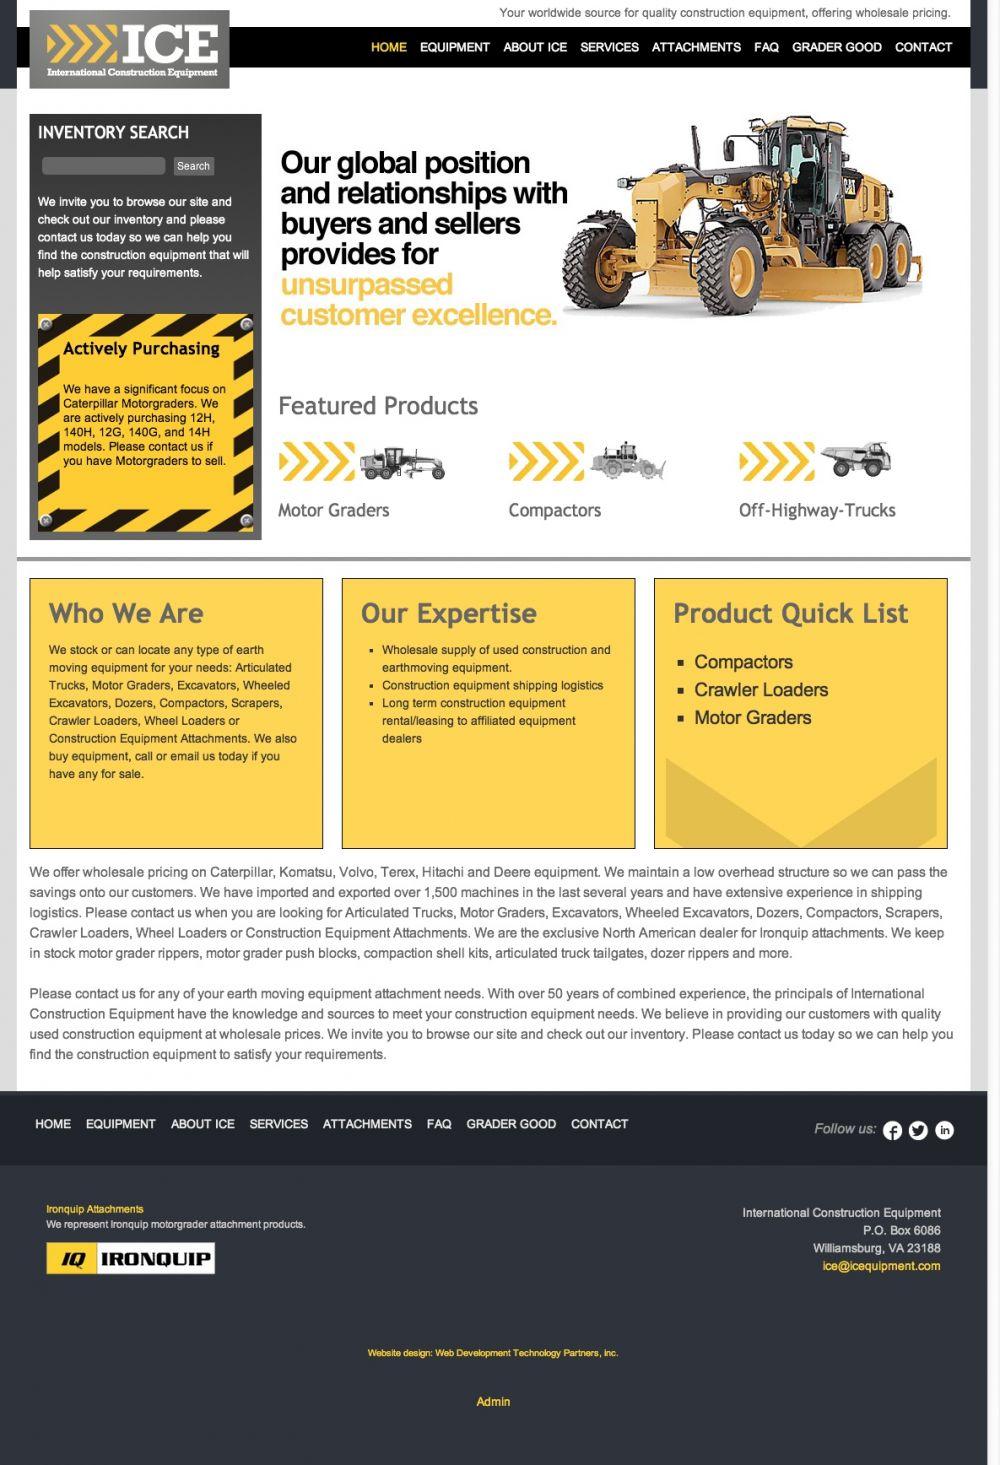 International Construction Equipment